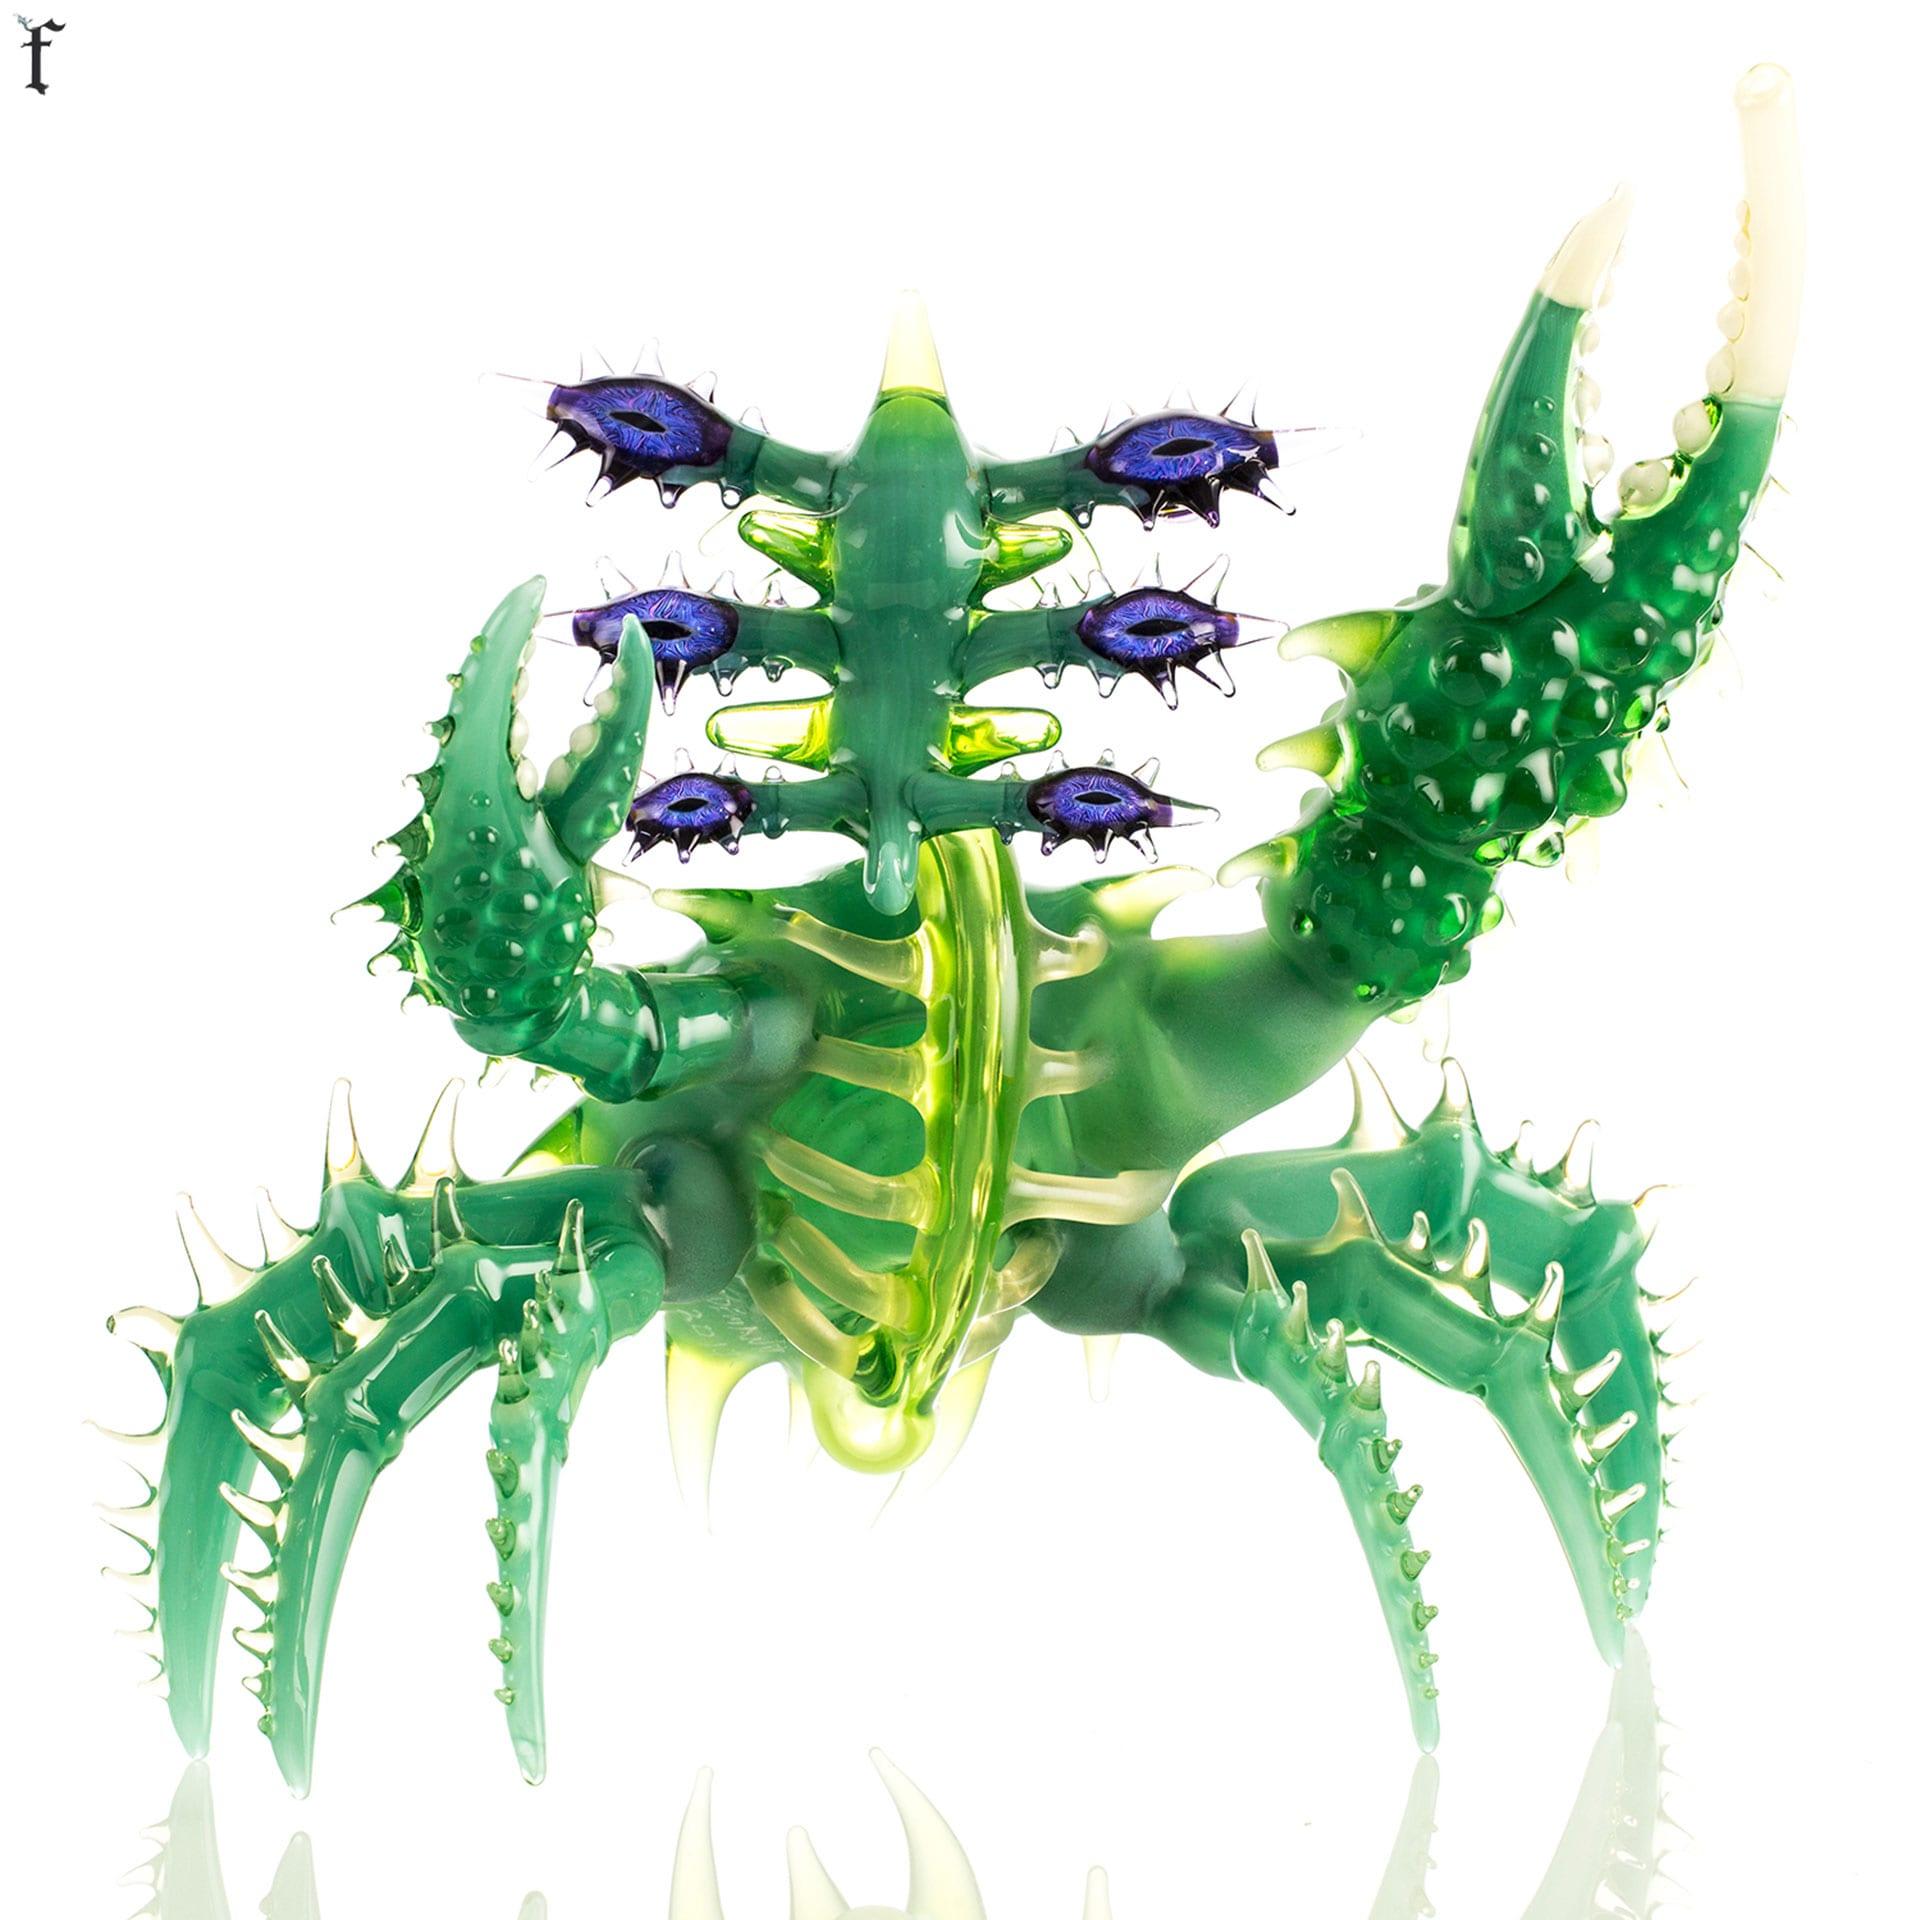 greenaliencrab